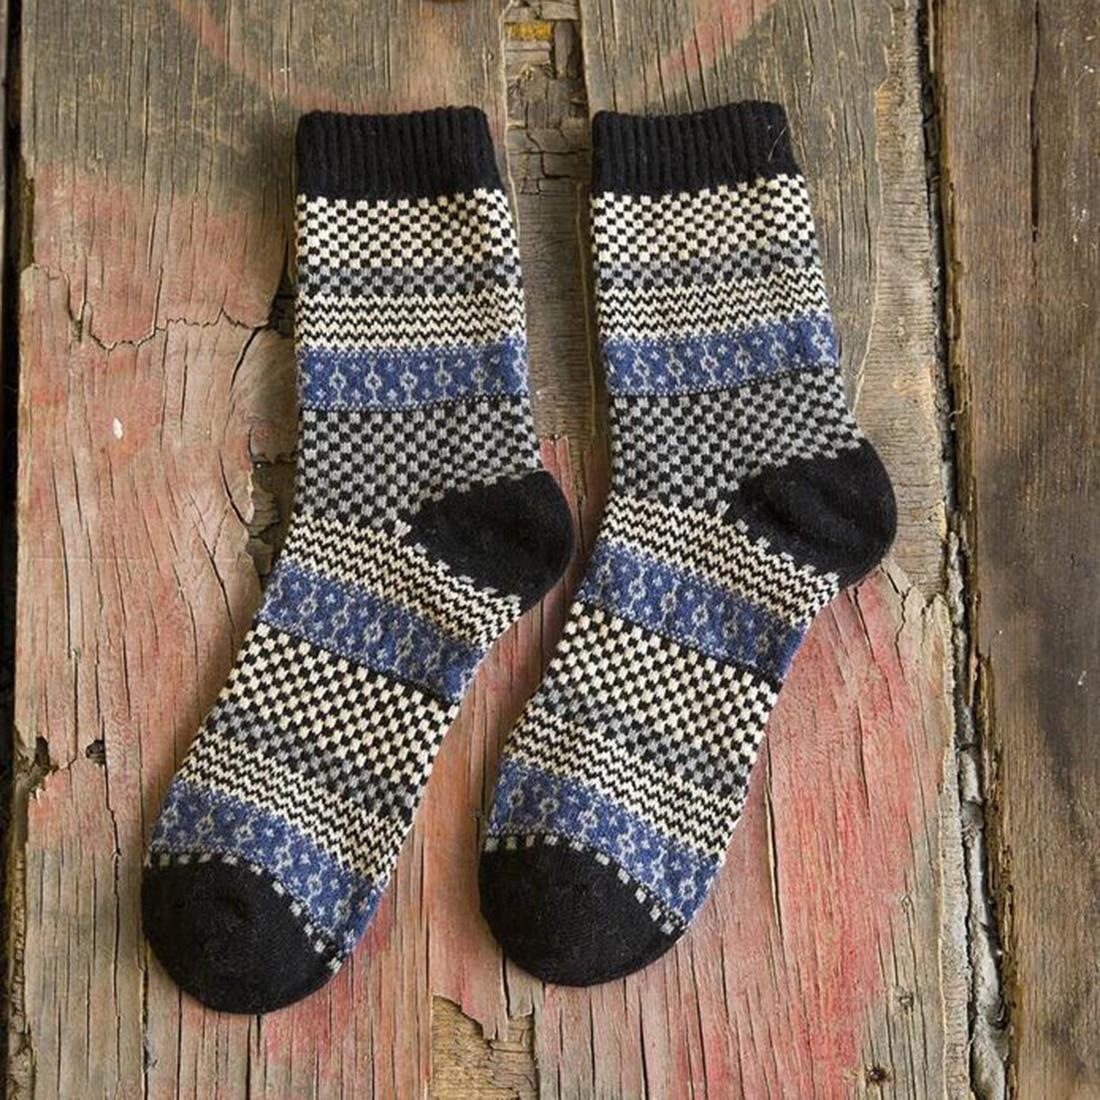 New Trendy 1Pair Wool Socks Men Thermal Winter Rabbit Wool Socks Male Thickening Socks Gift